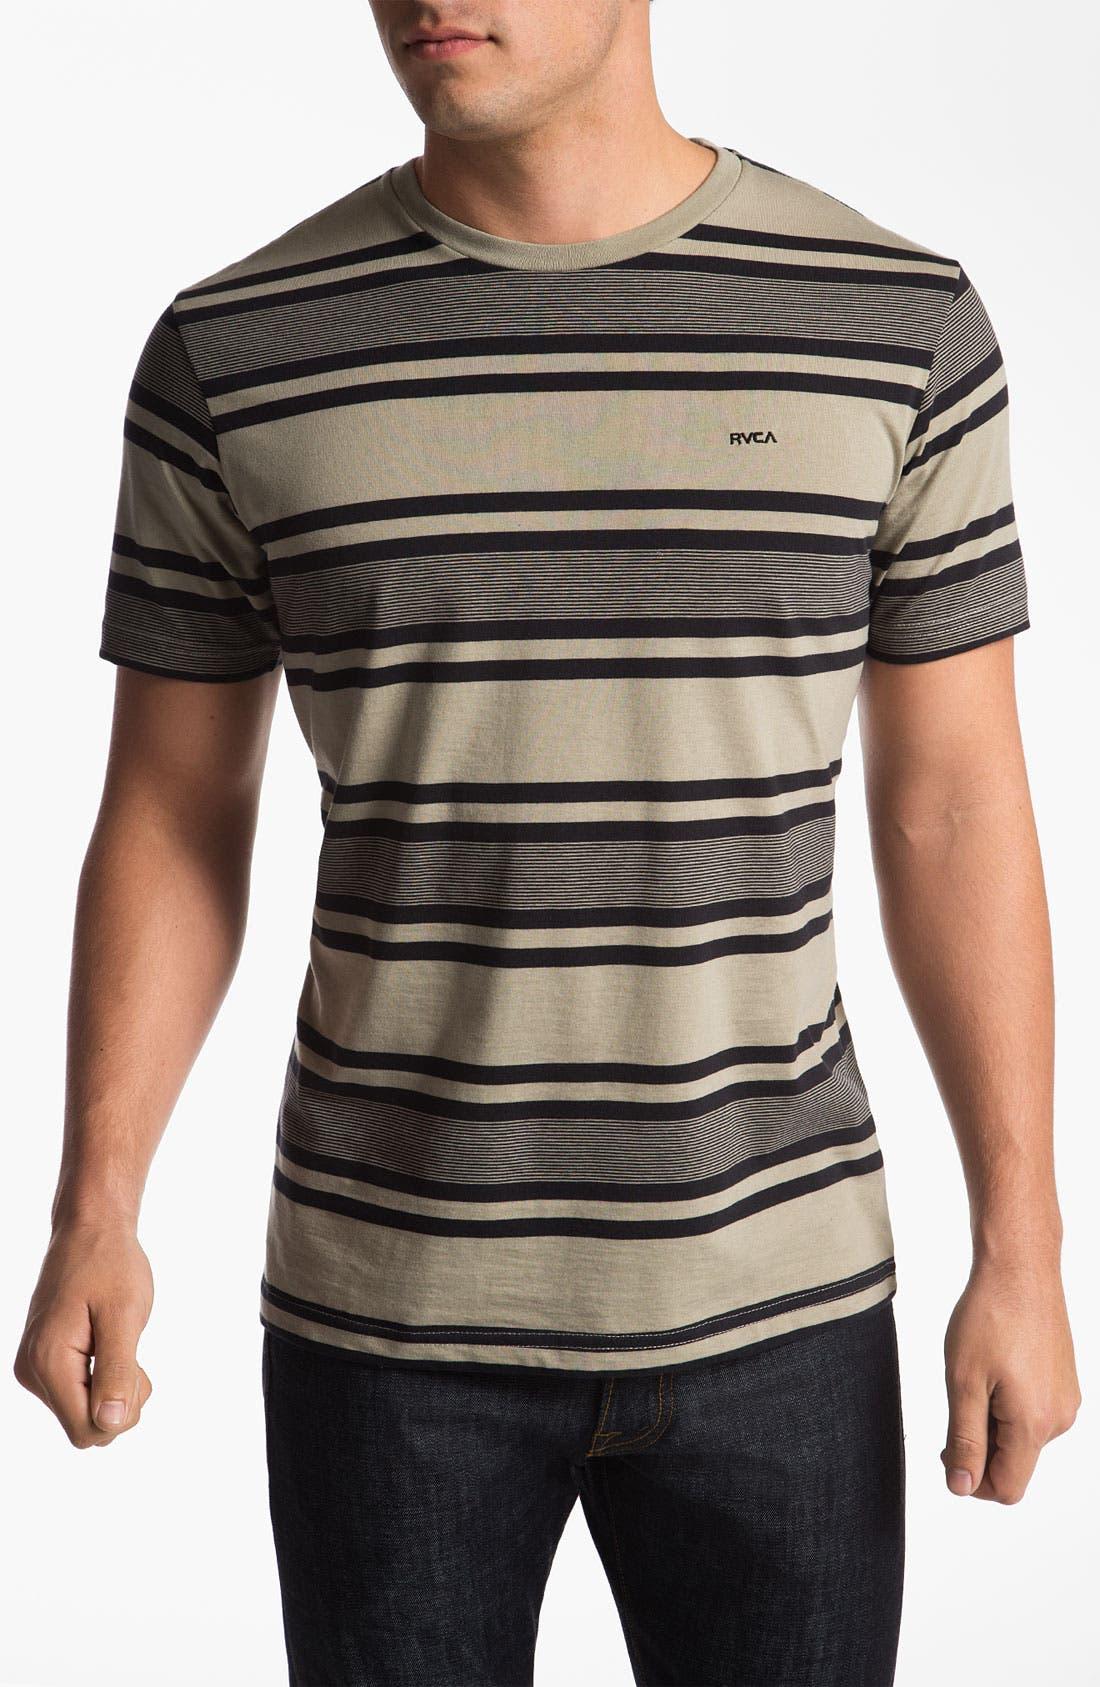 Main Image - RVCA 'SOS' Stripe Crewneck T-Shirt